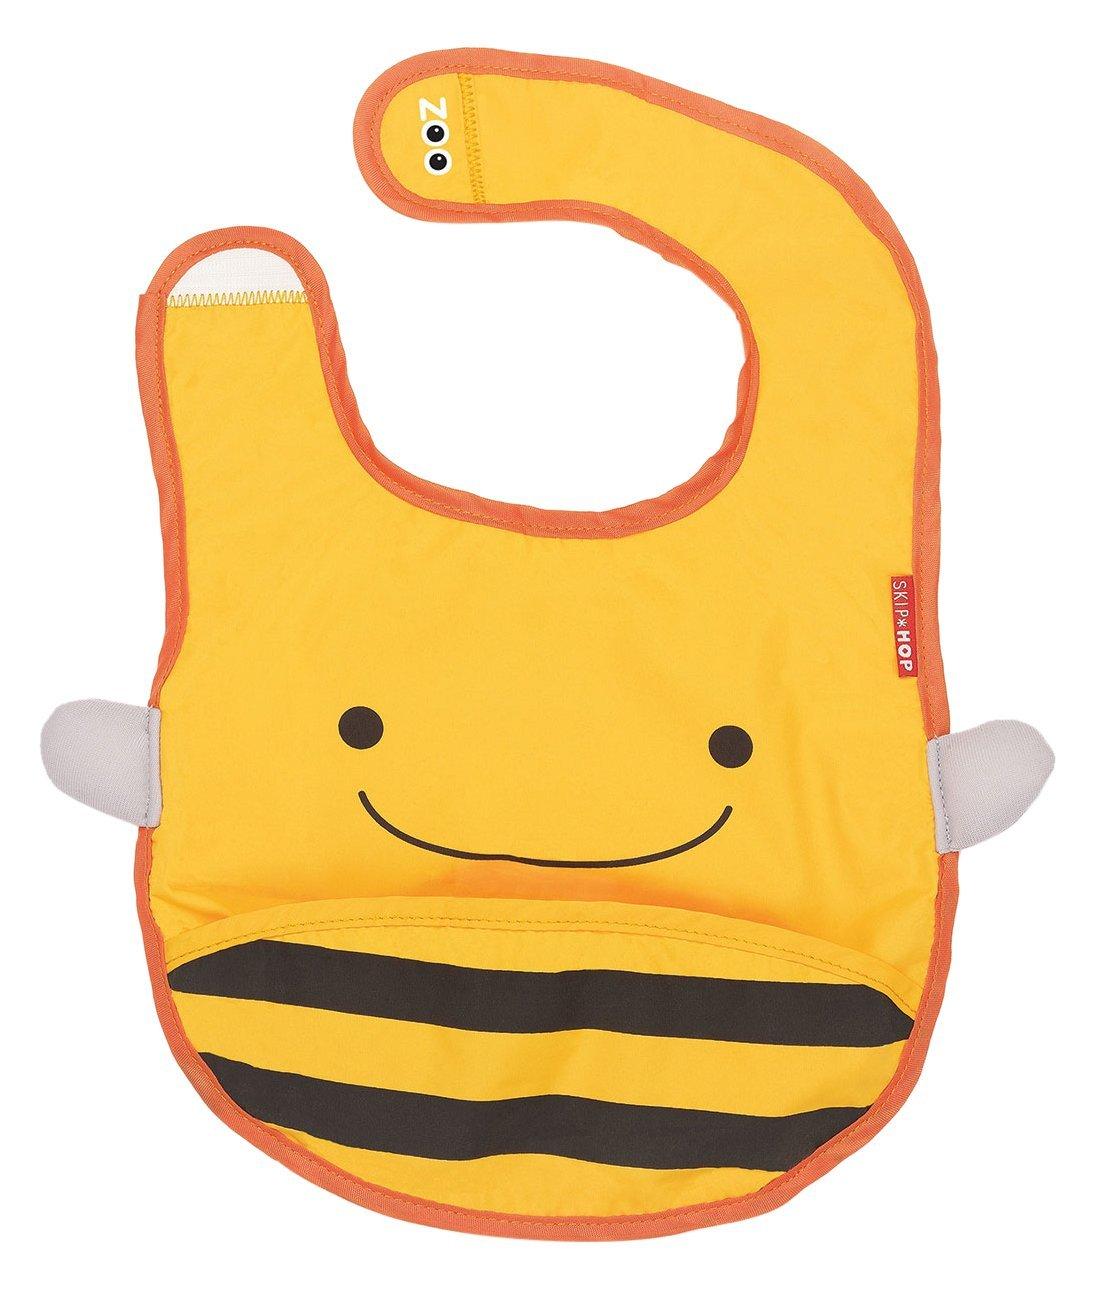 Skip Hop Zoo Infant and Toddler Tuck-Away Bib, Brooklyn Bee, Multi